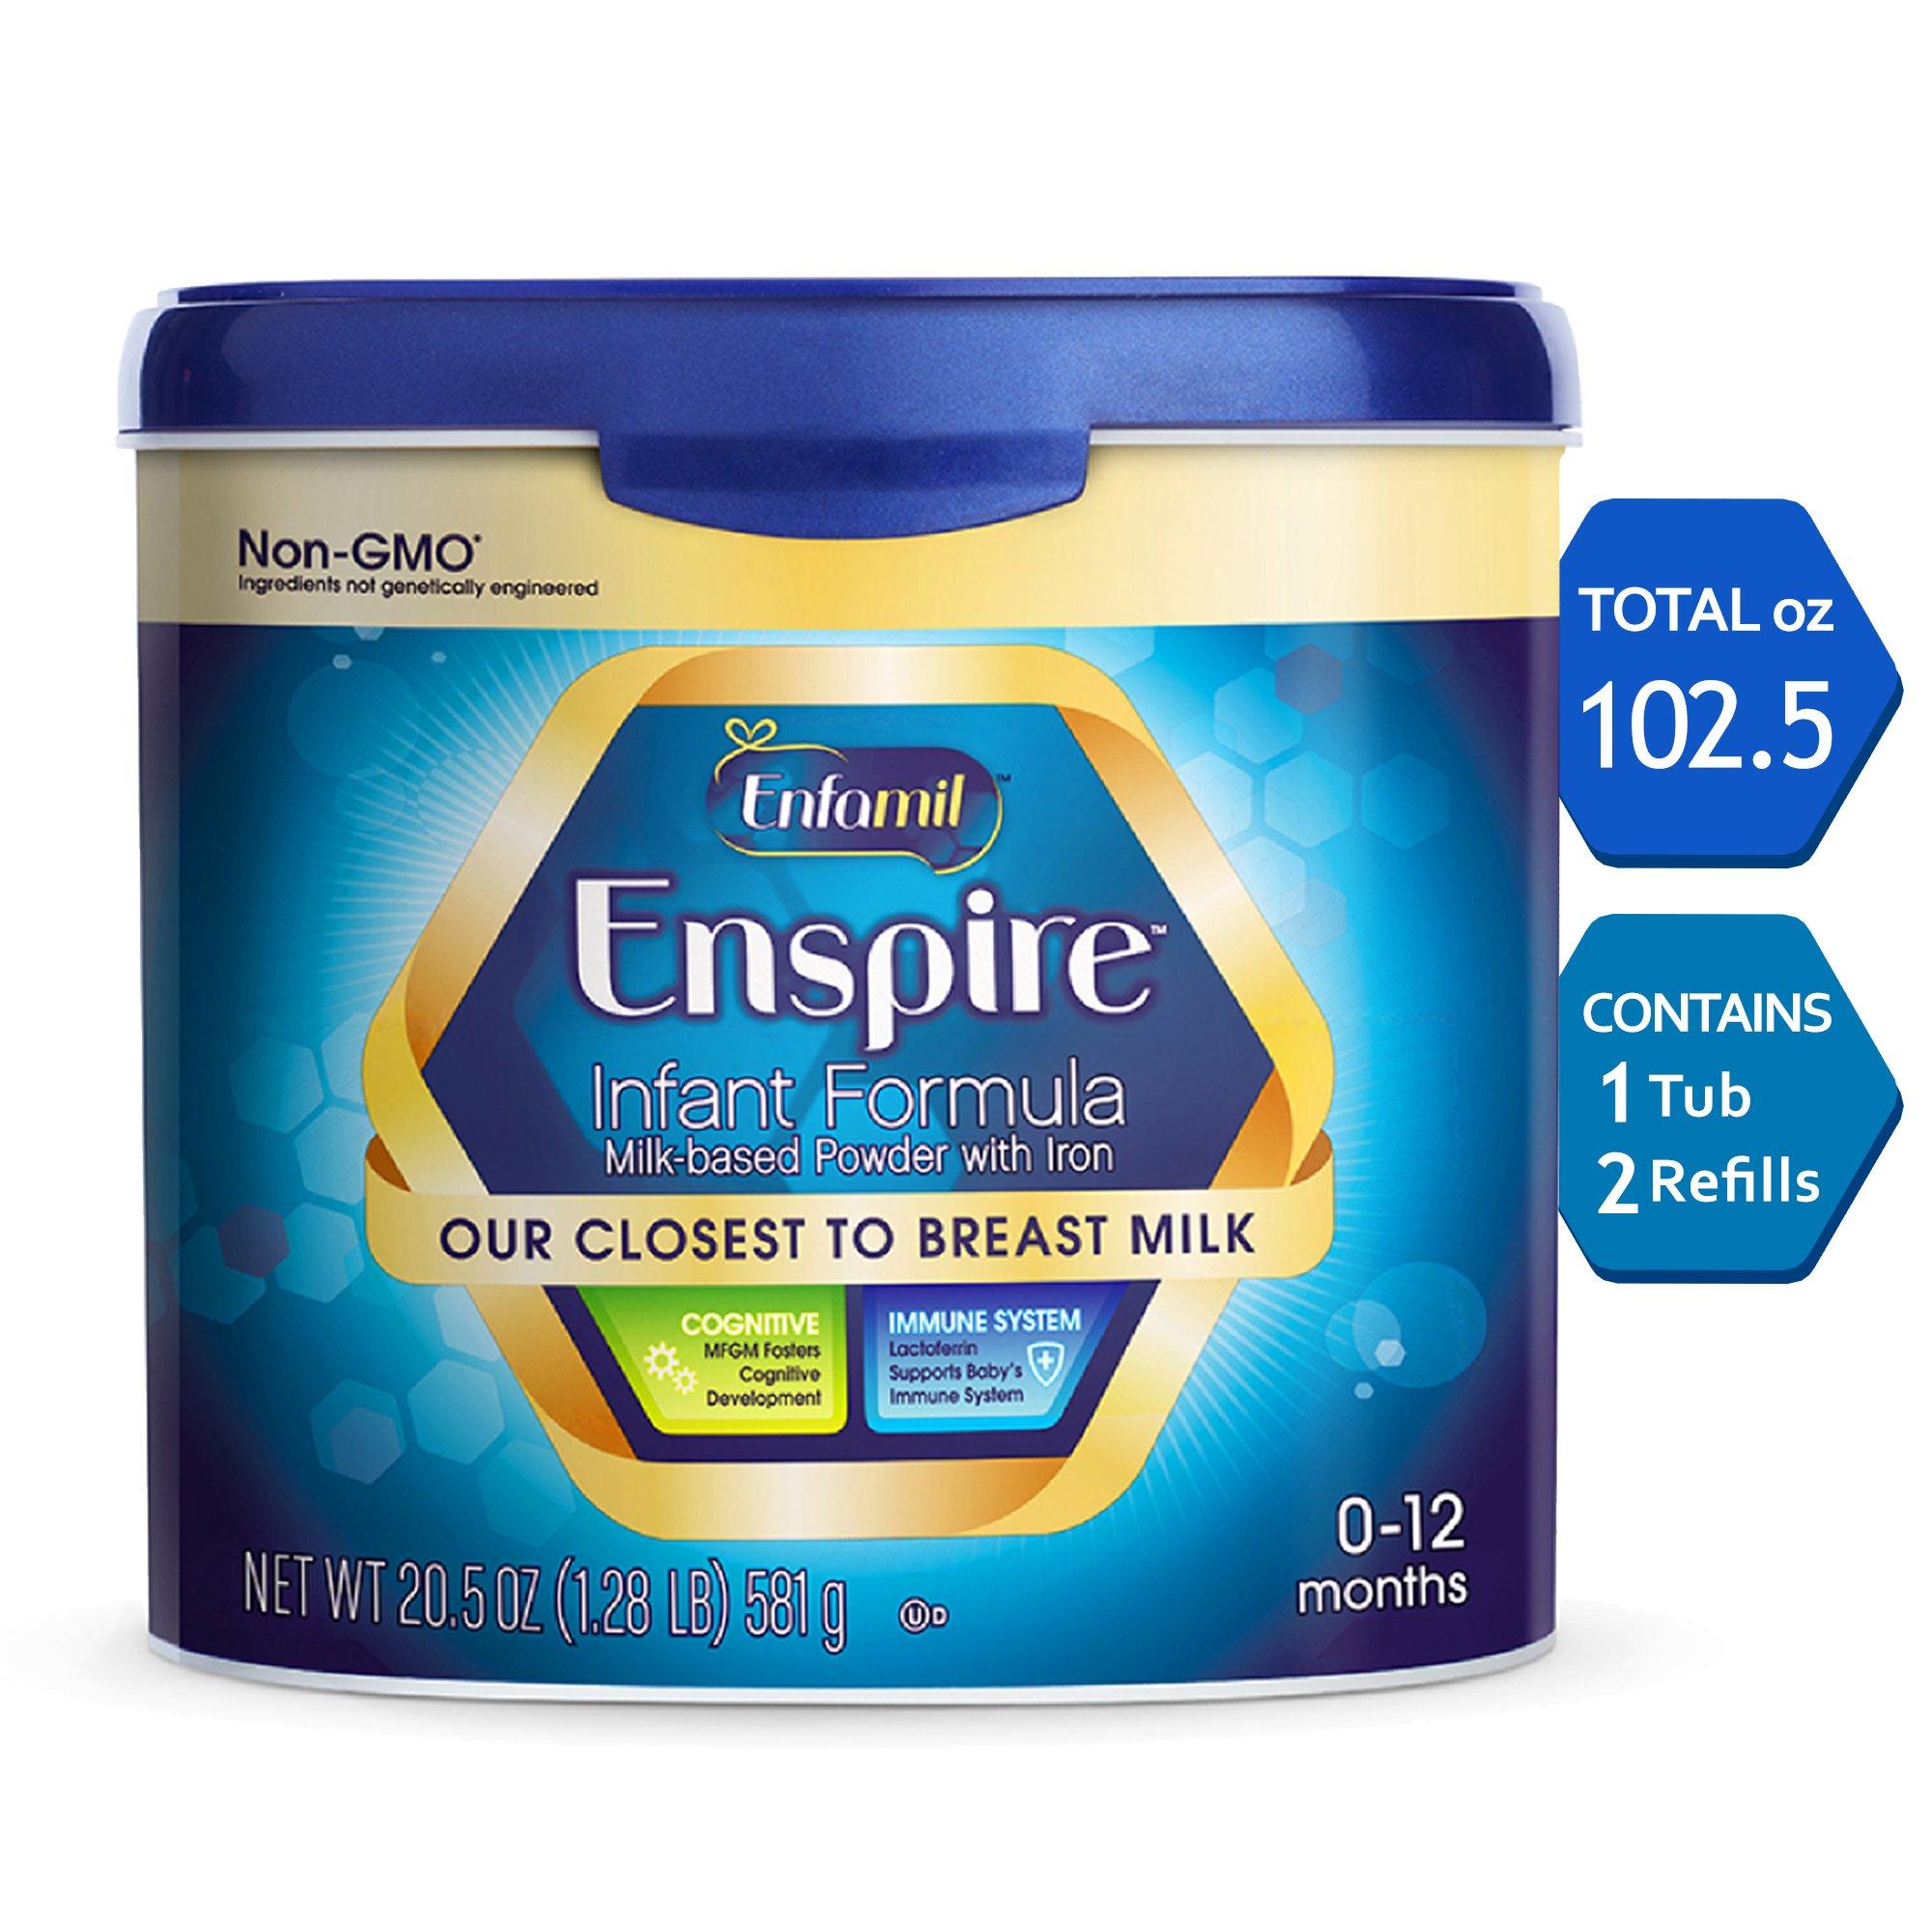 Amazon.com: Enfamil Enspire Infant Formula - Our Closest to Breast ...